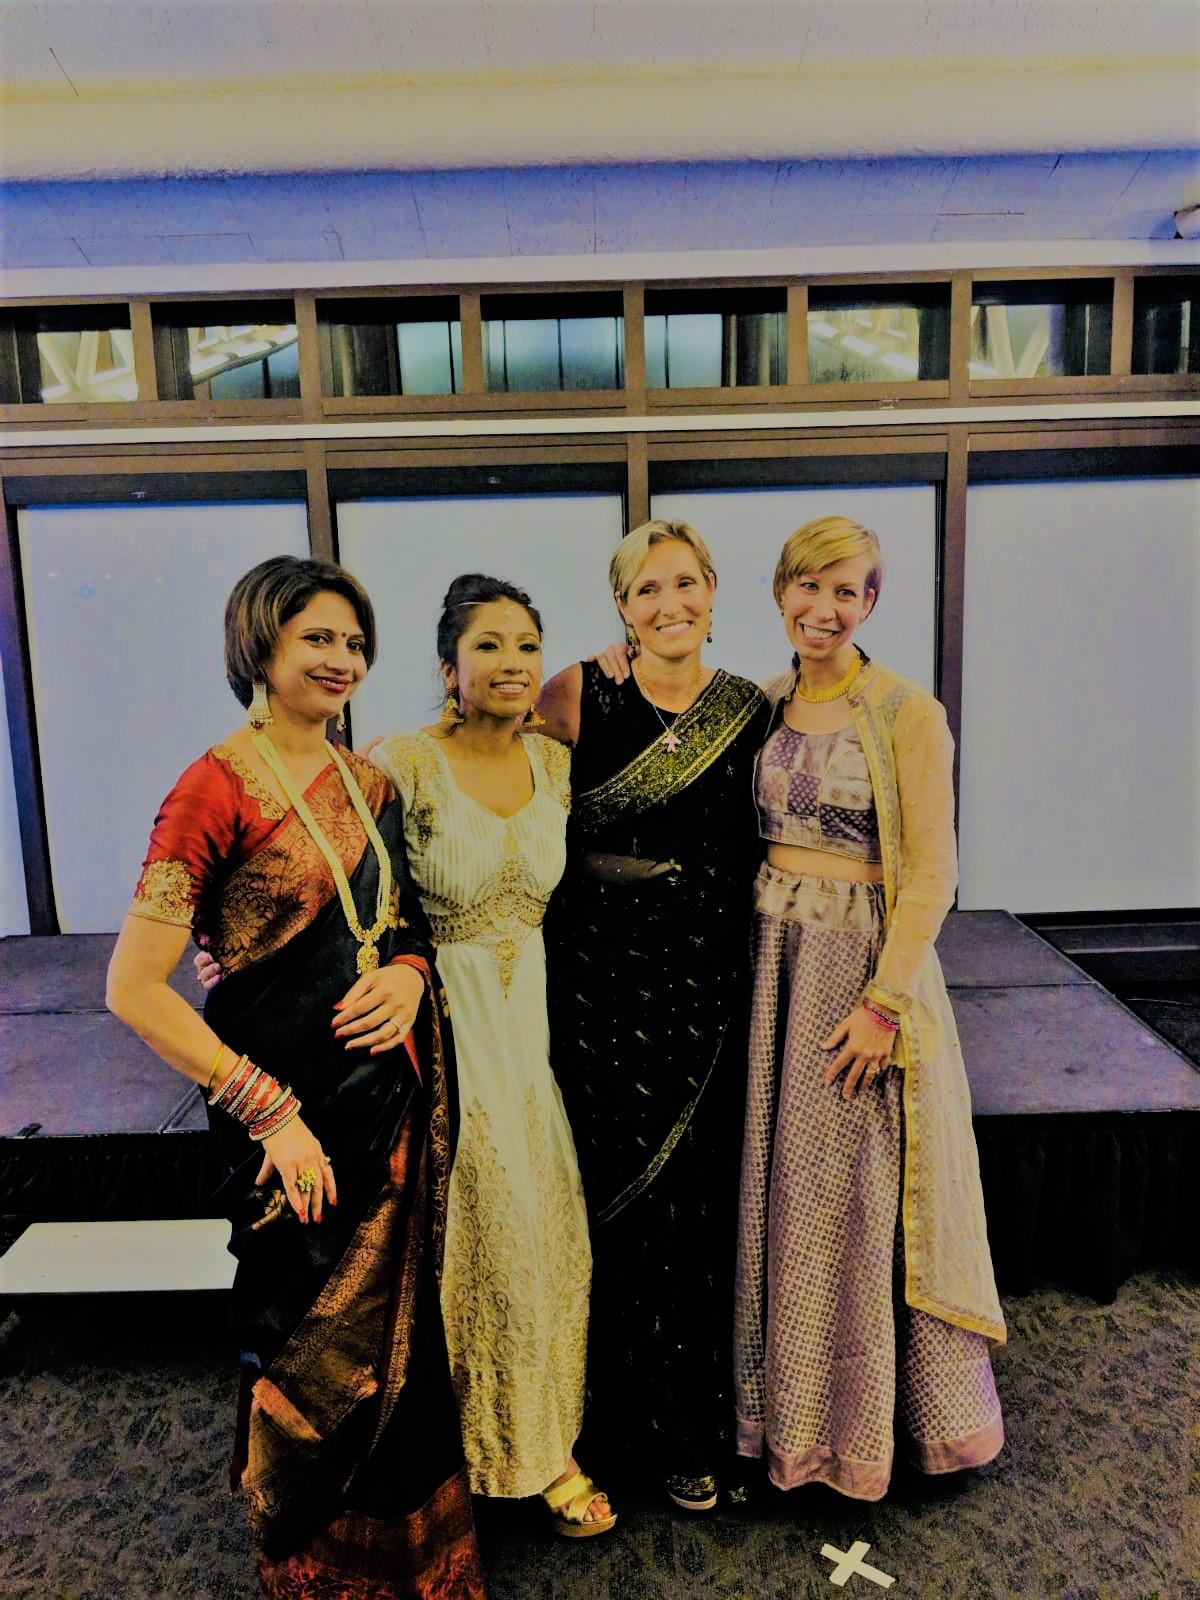 L to R: Richa Khandelwal, Lopa Das Roy, Evey Cormican, Christine Post